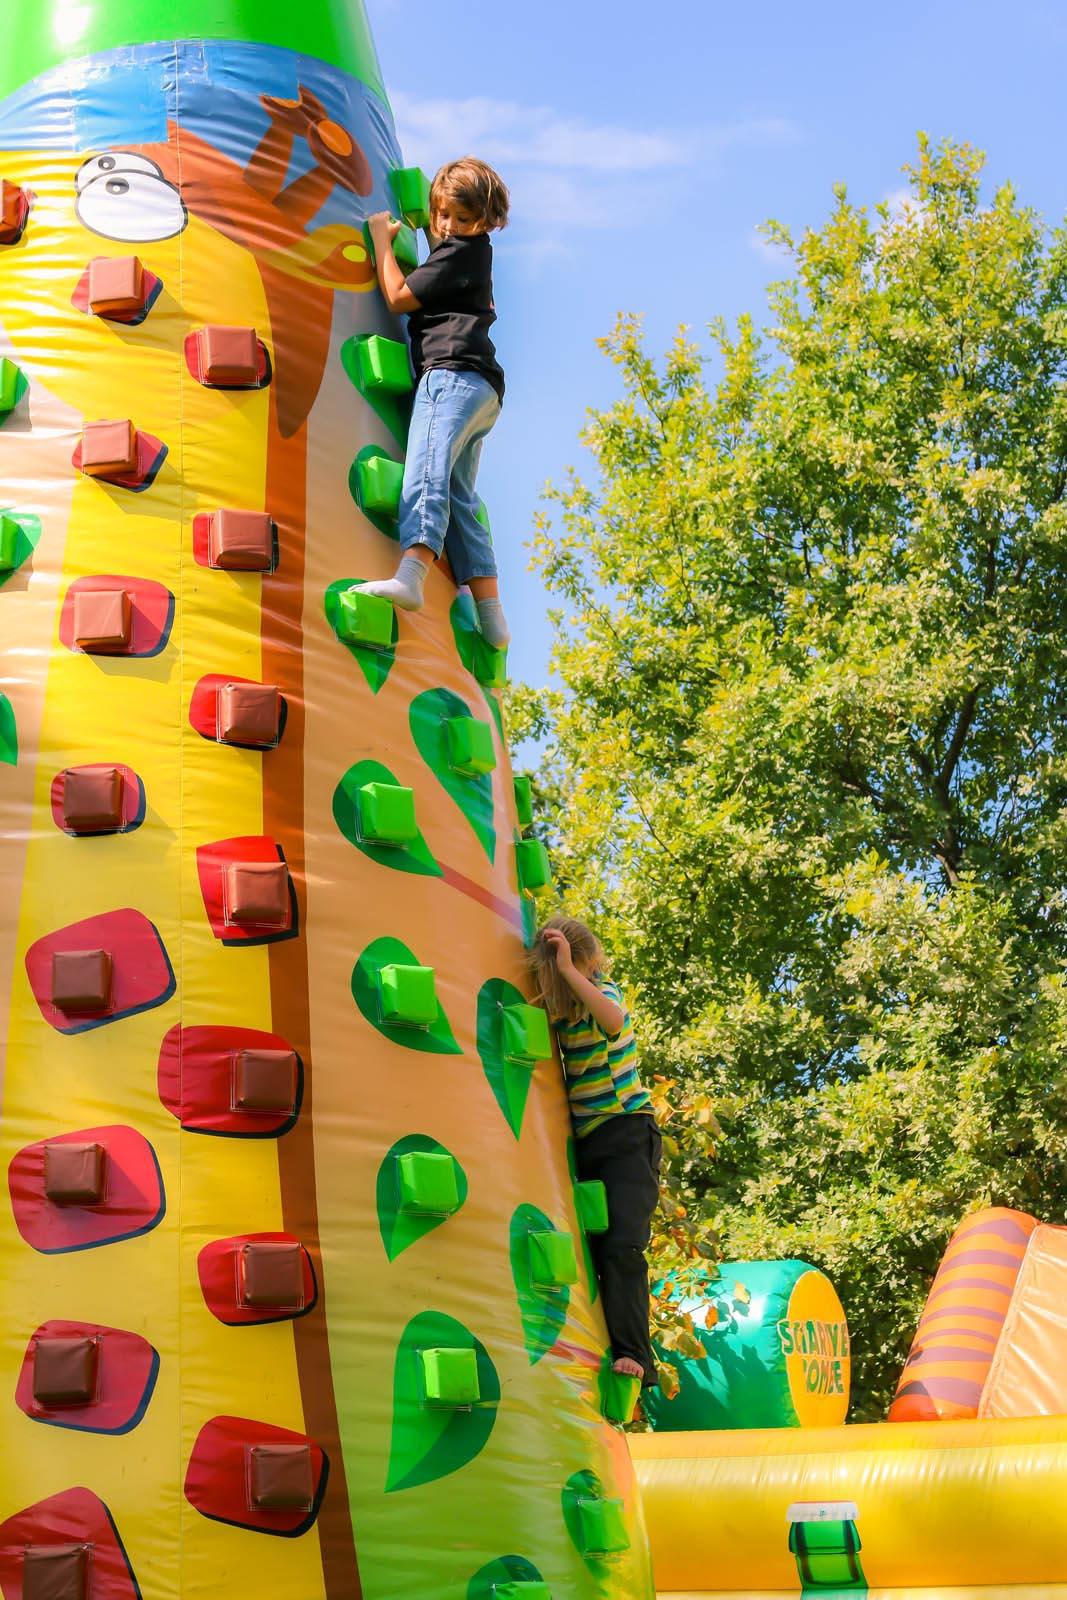 Wien Kinderparty Kinderunterhaltung Kinderparty In Wien Auf